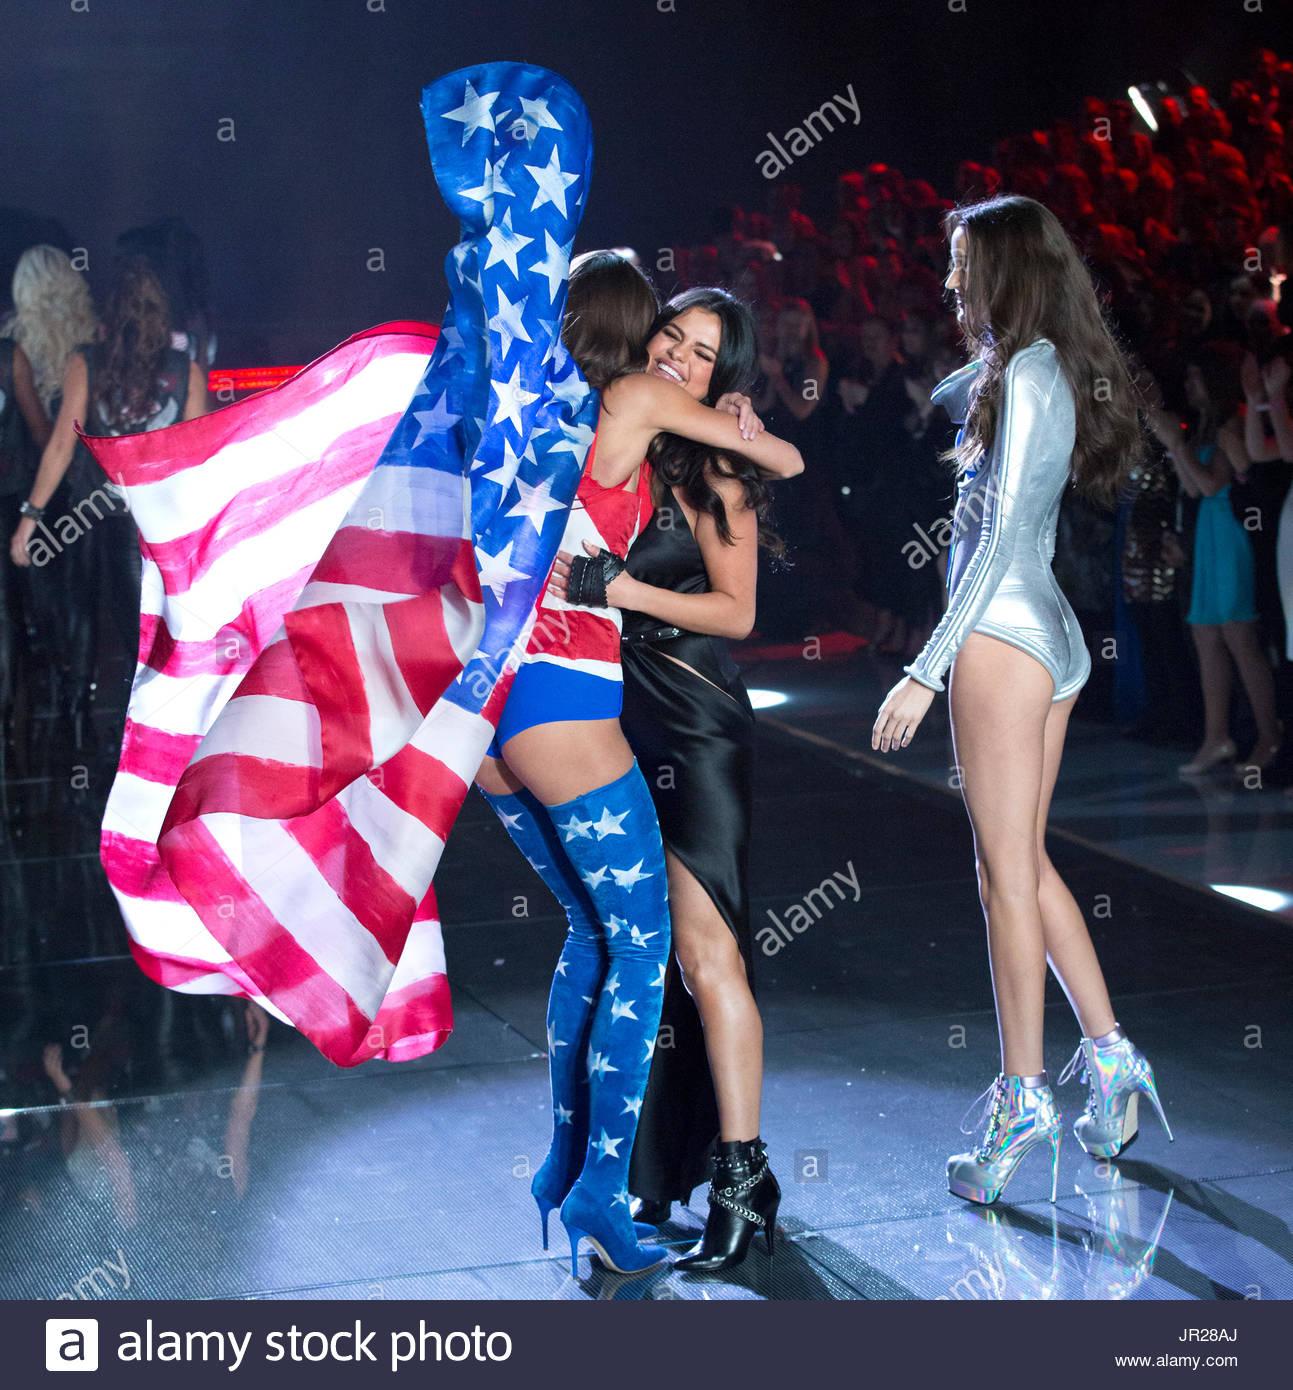 Megan Puleri USA 2015 nudes (87 fotos), pictures Feet, Snapchat, butt 2018